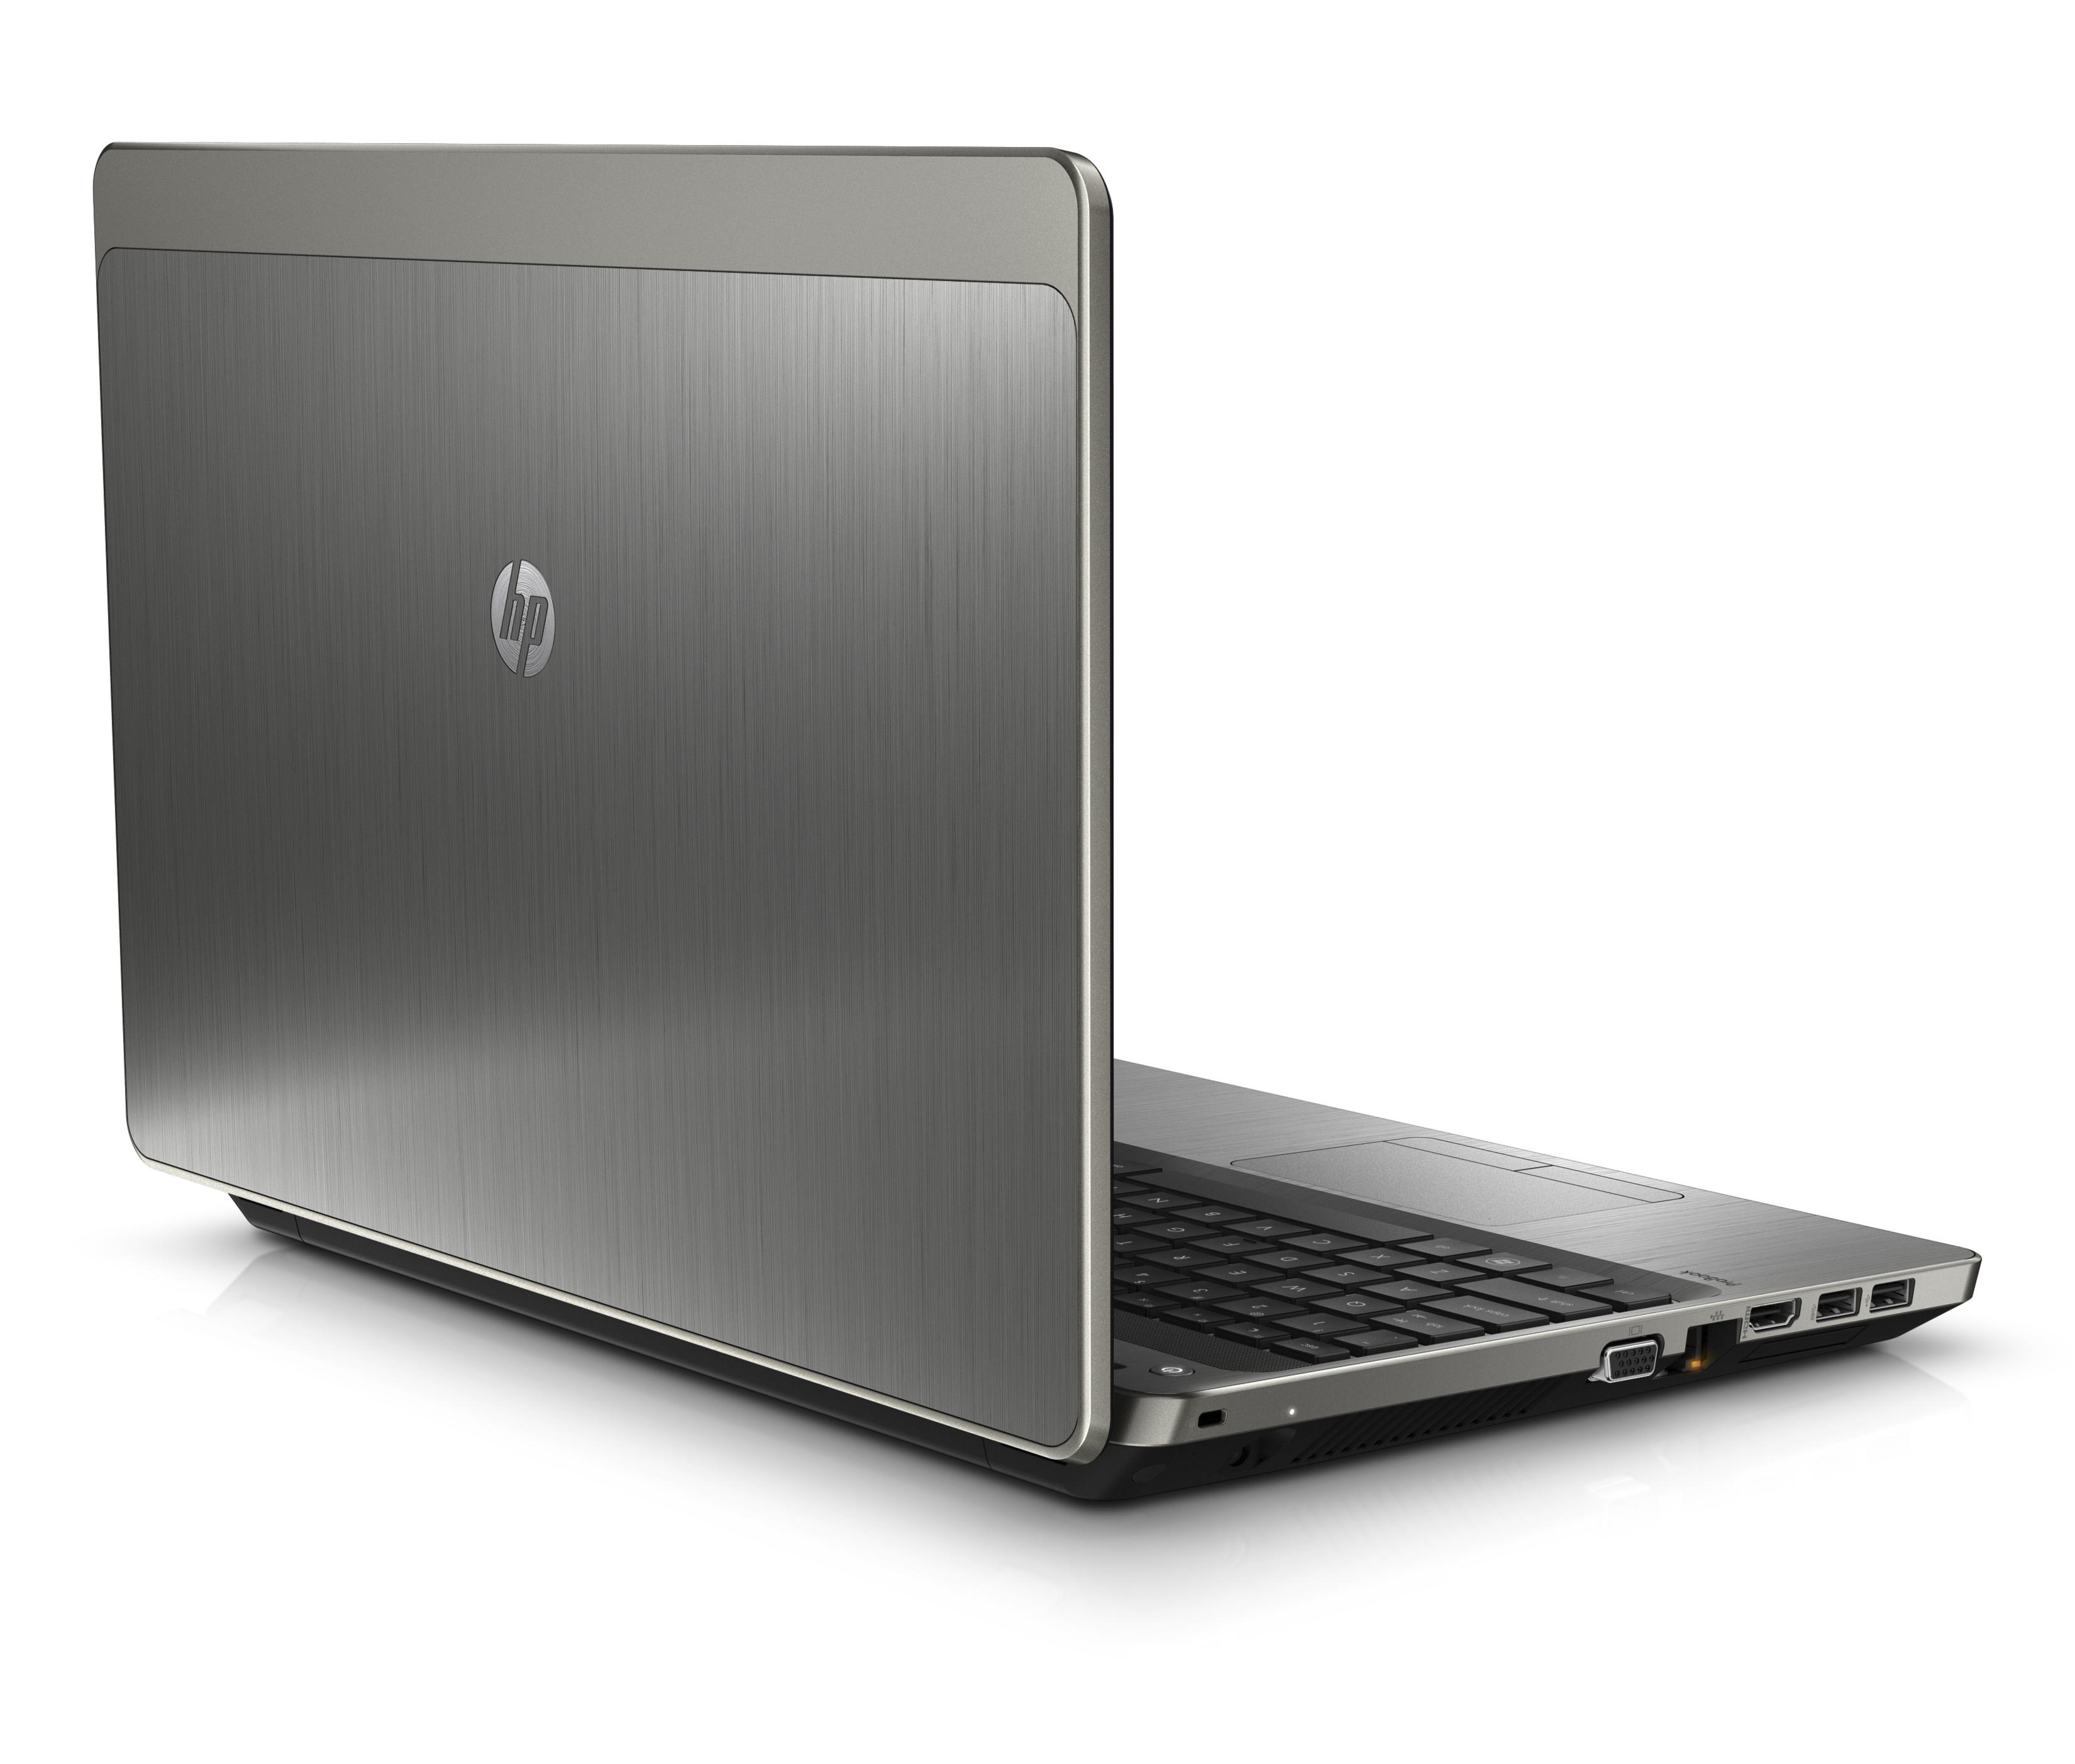 Hp probook 6565b wifi drivers | HP ProBook 6565b Notebook PC